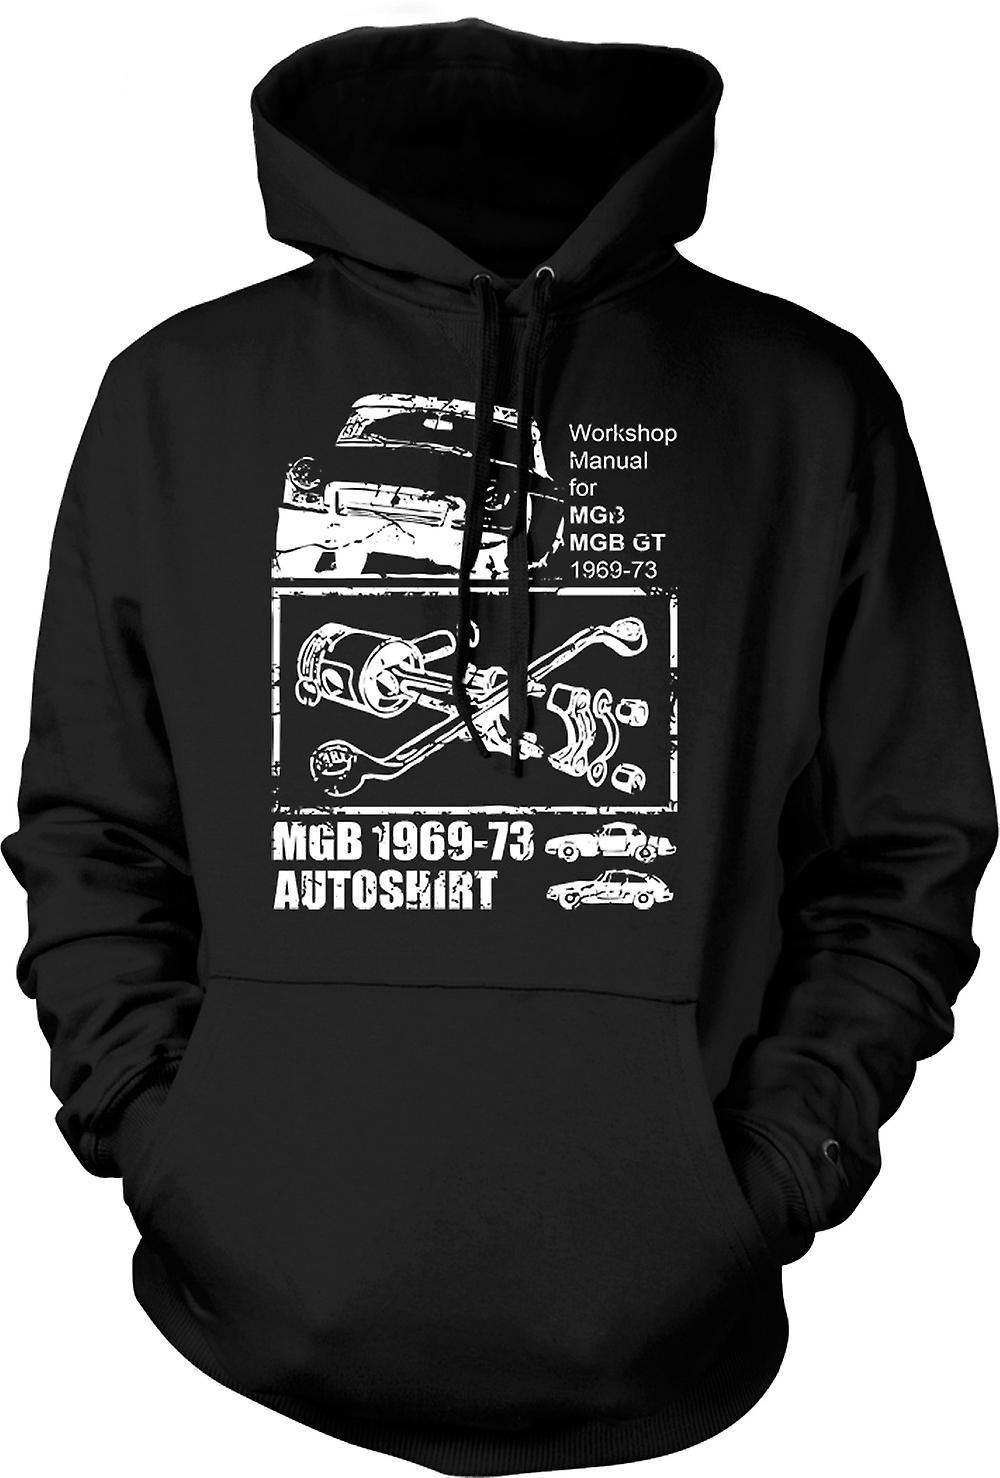 Mens Hoodie - MGB GT 69 - 73 - Classic Car